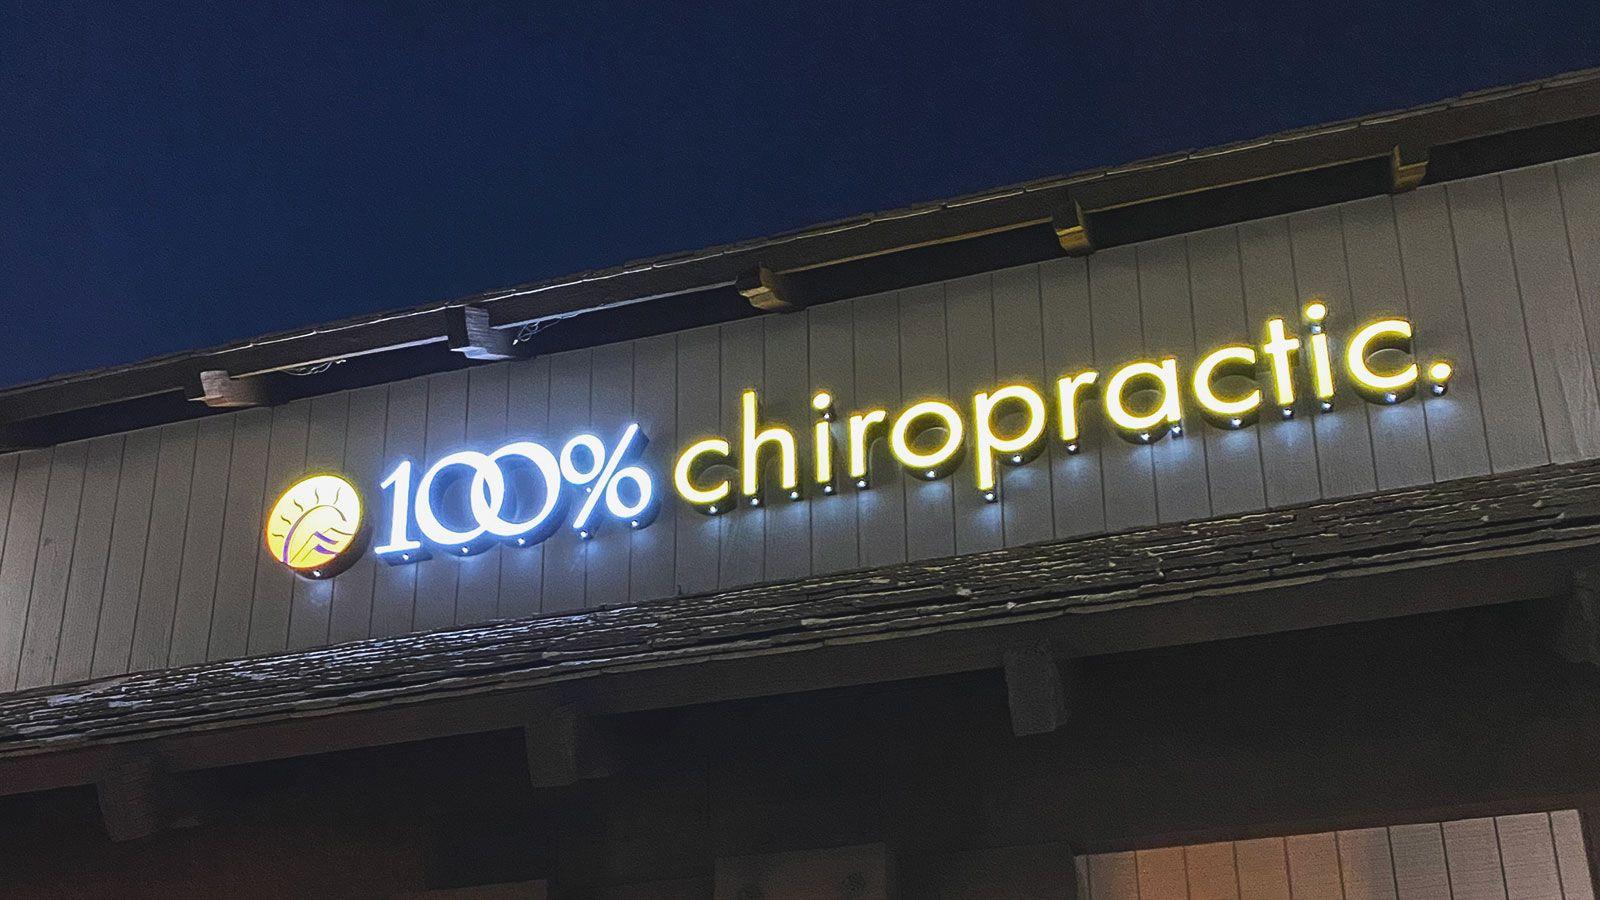 chiropractic outdoor illuminated sign